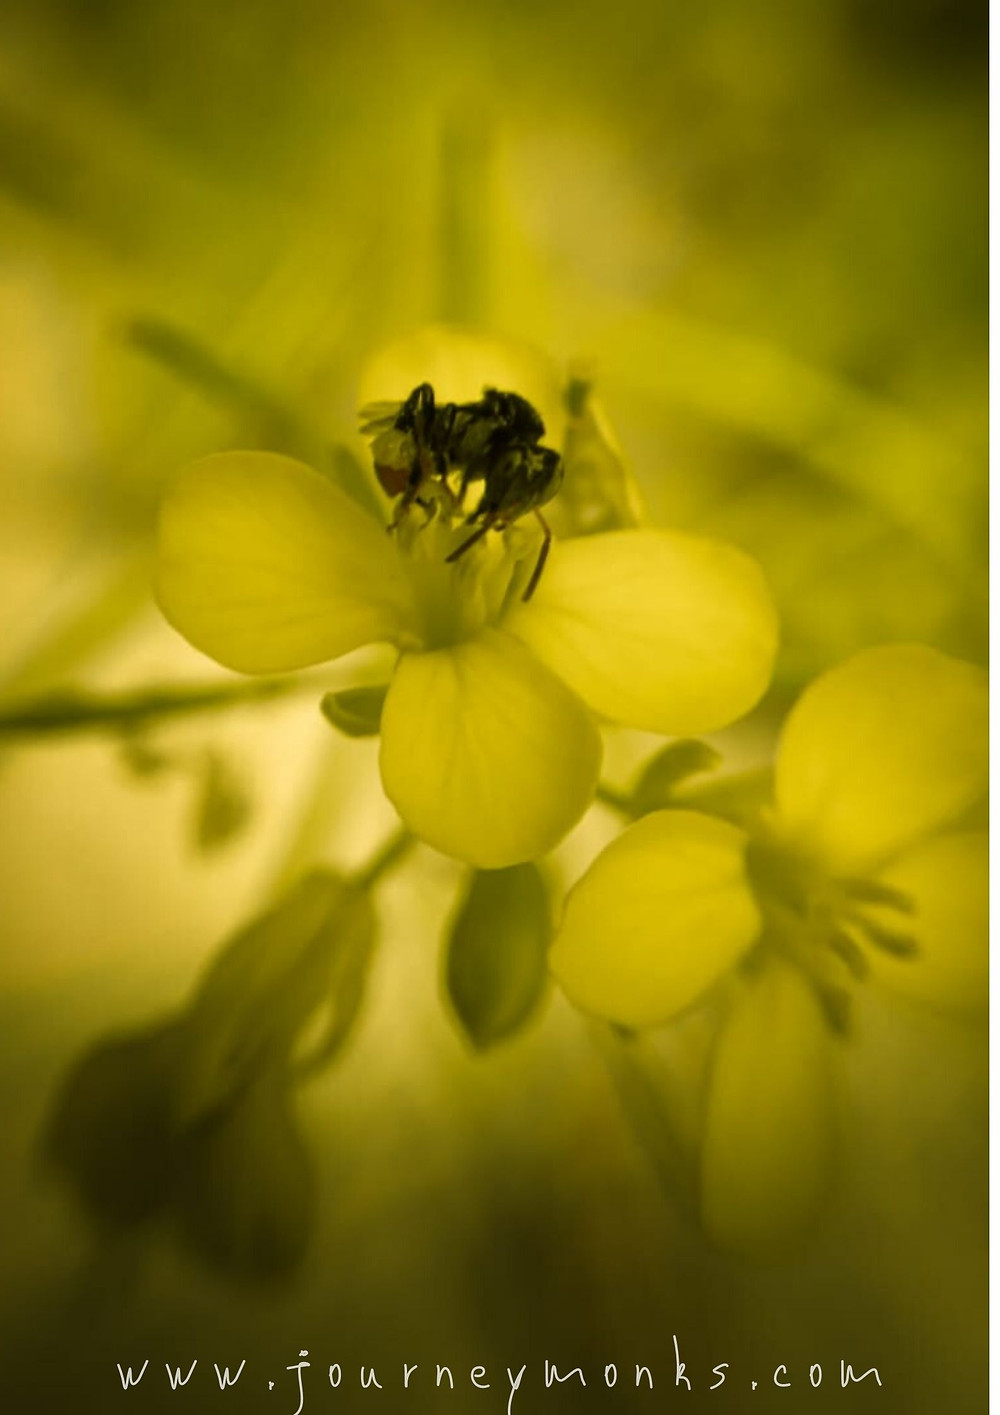 be u,bee wallpaper,wallpaper for mobile,wallpaper for pc,yellow flower,honey bee